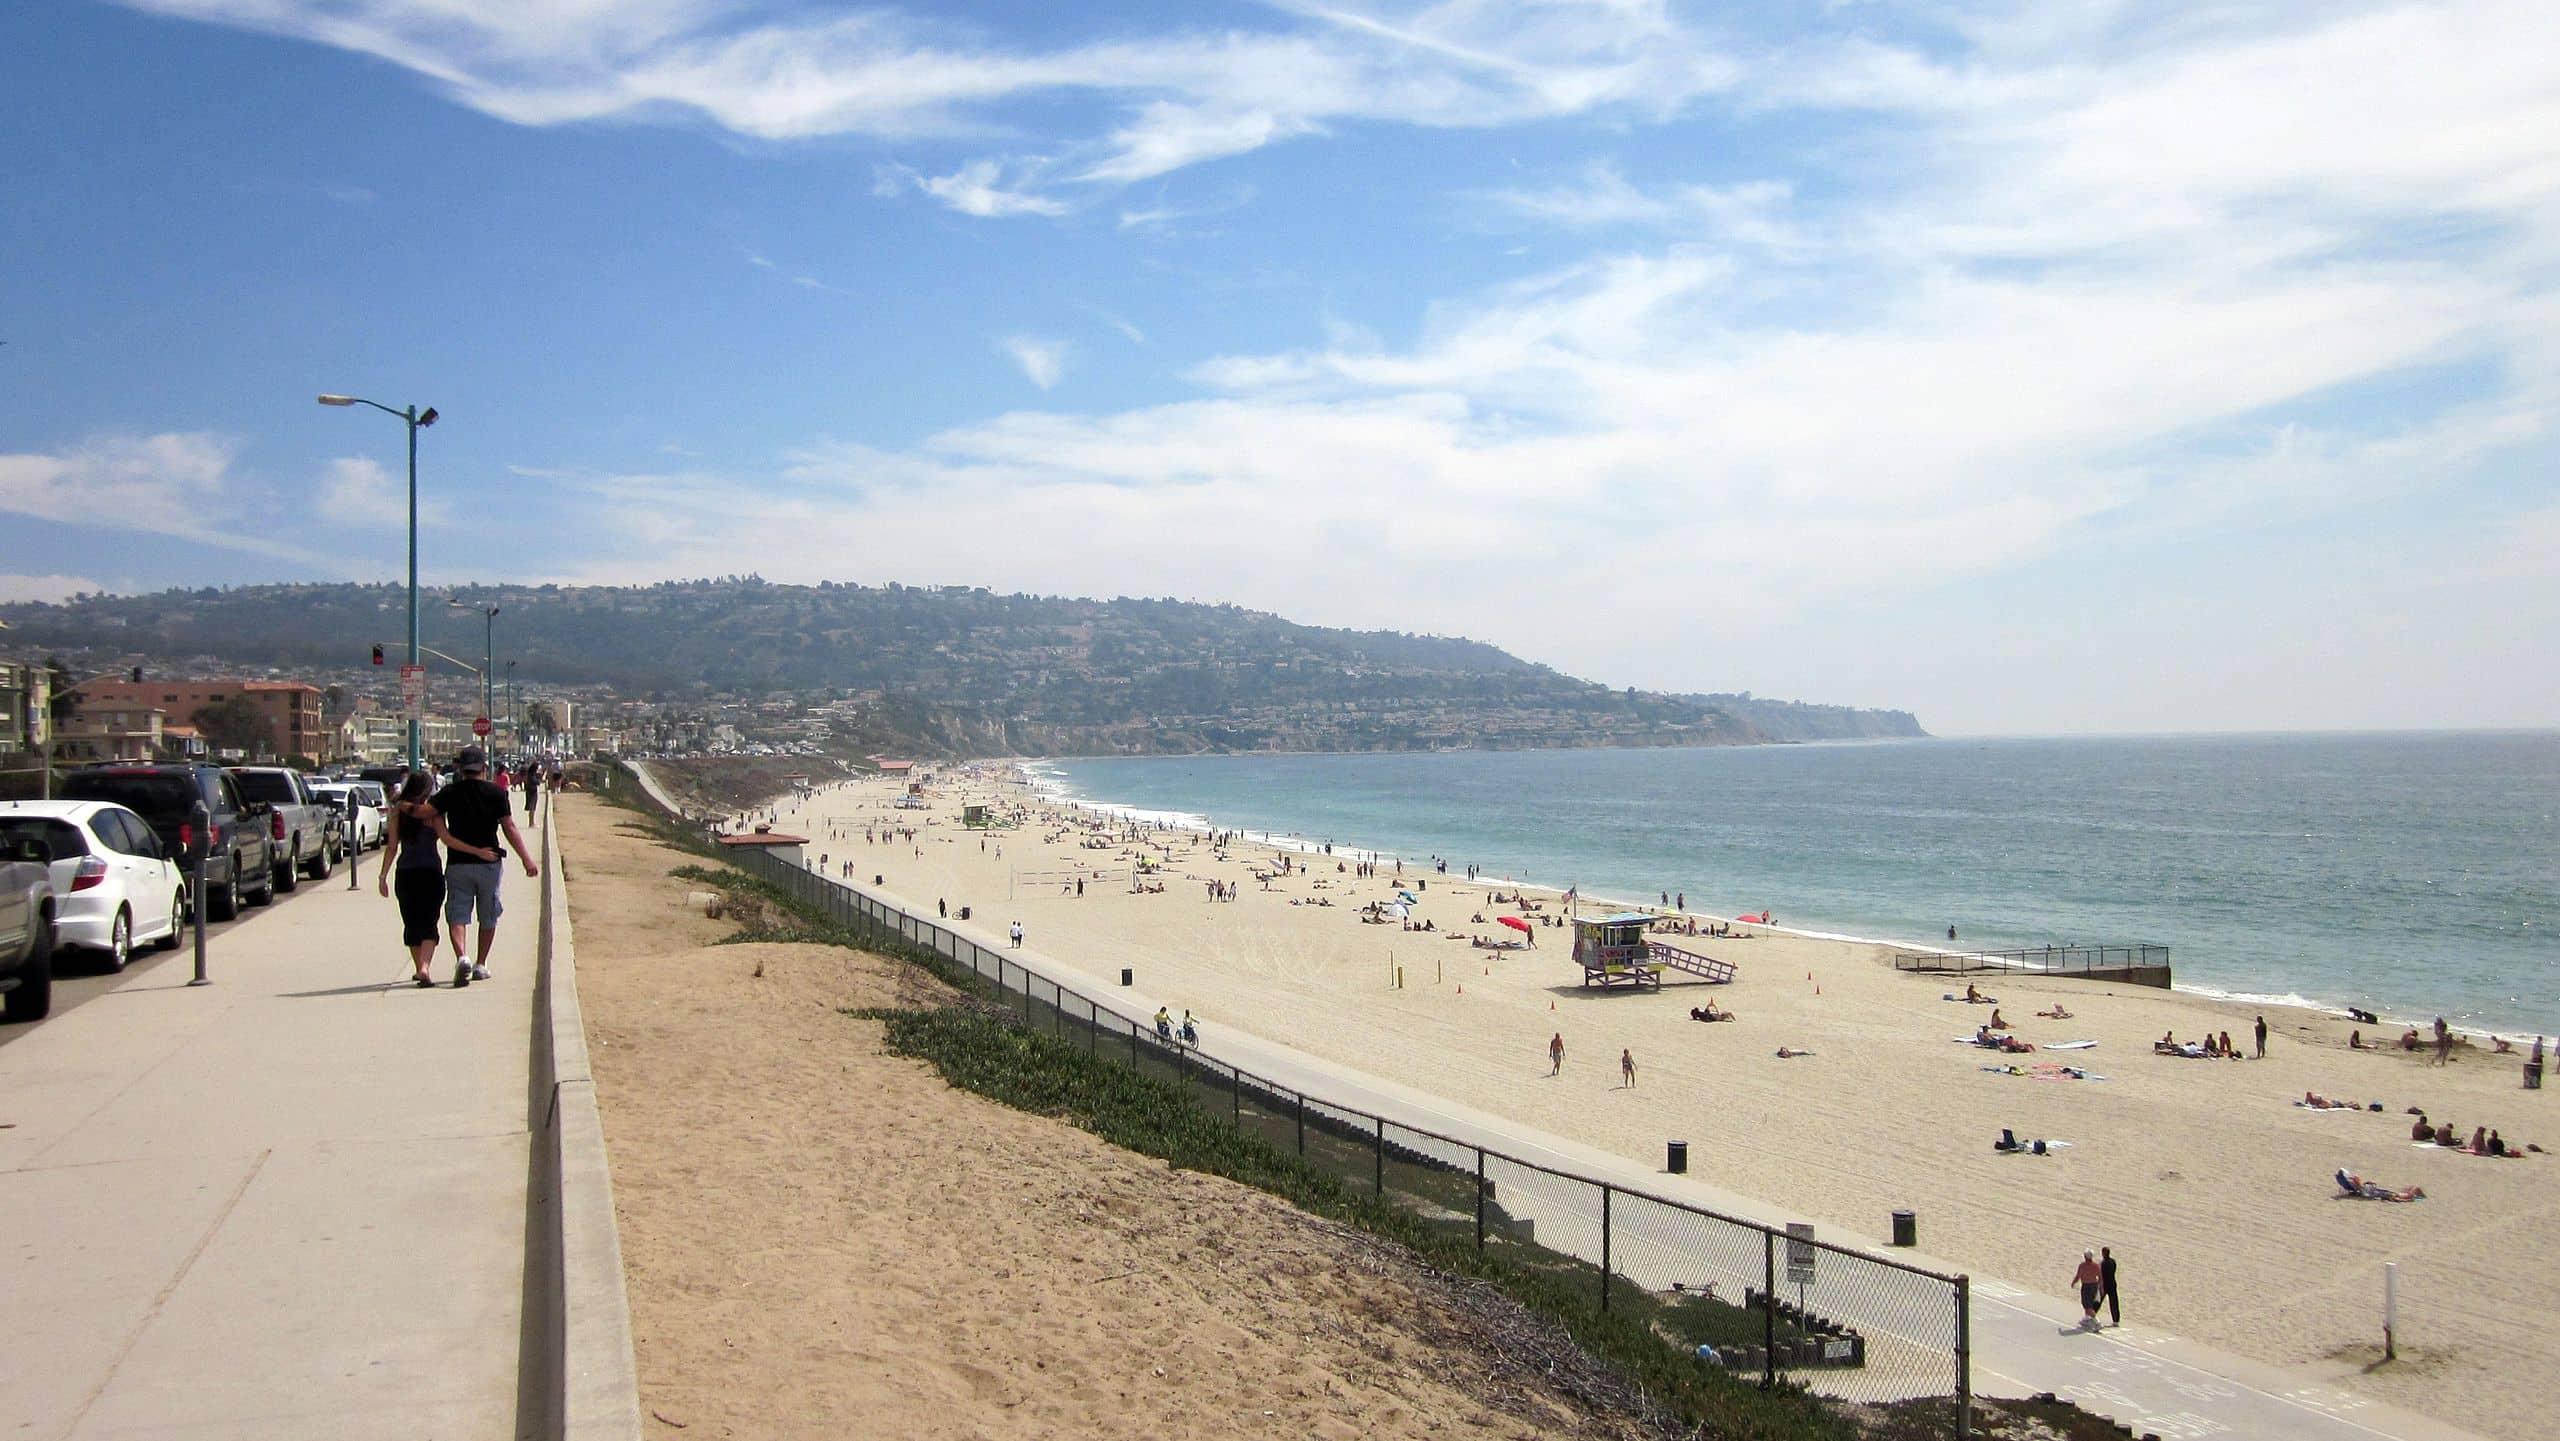 Torrance Beach, Torrance, California